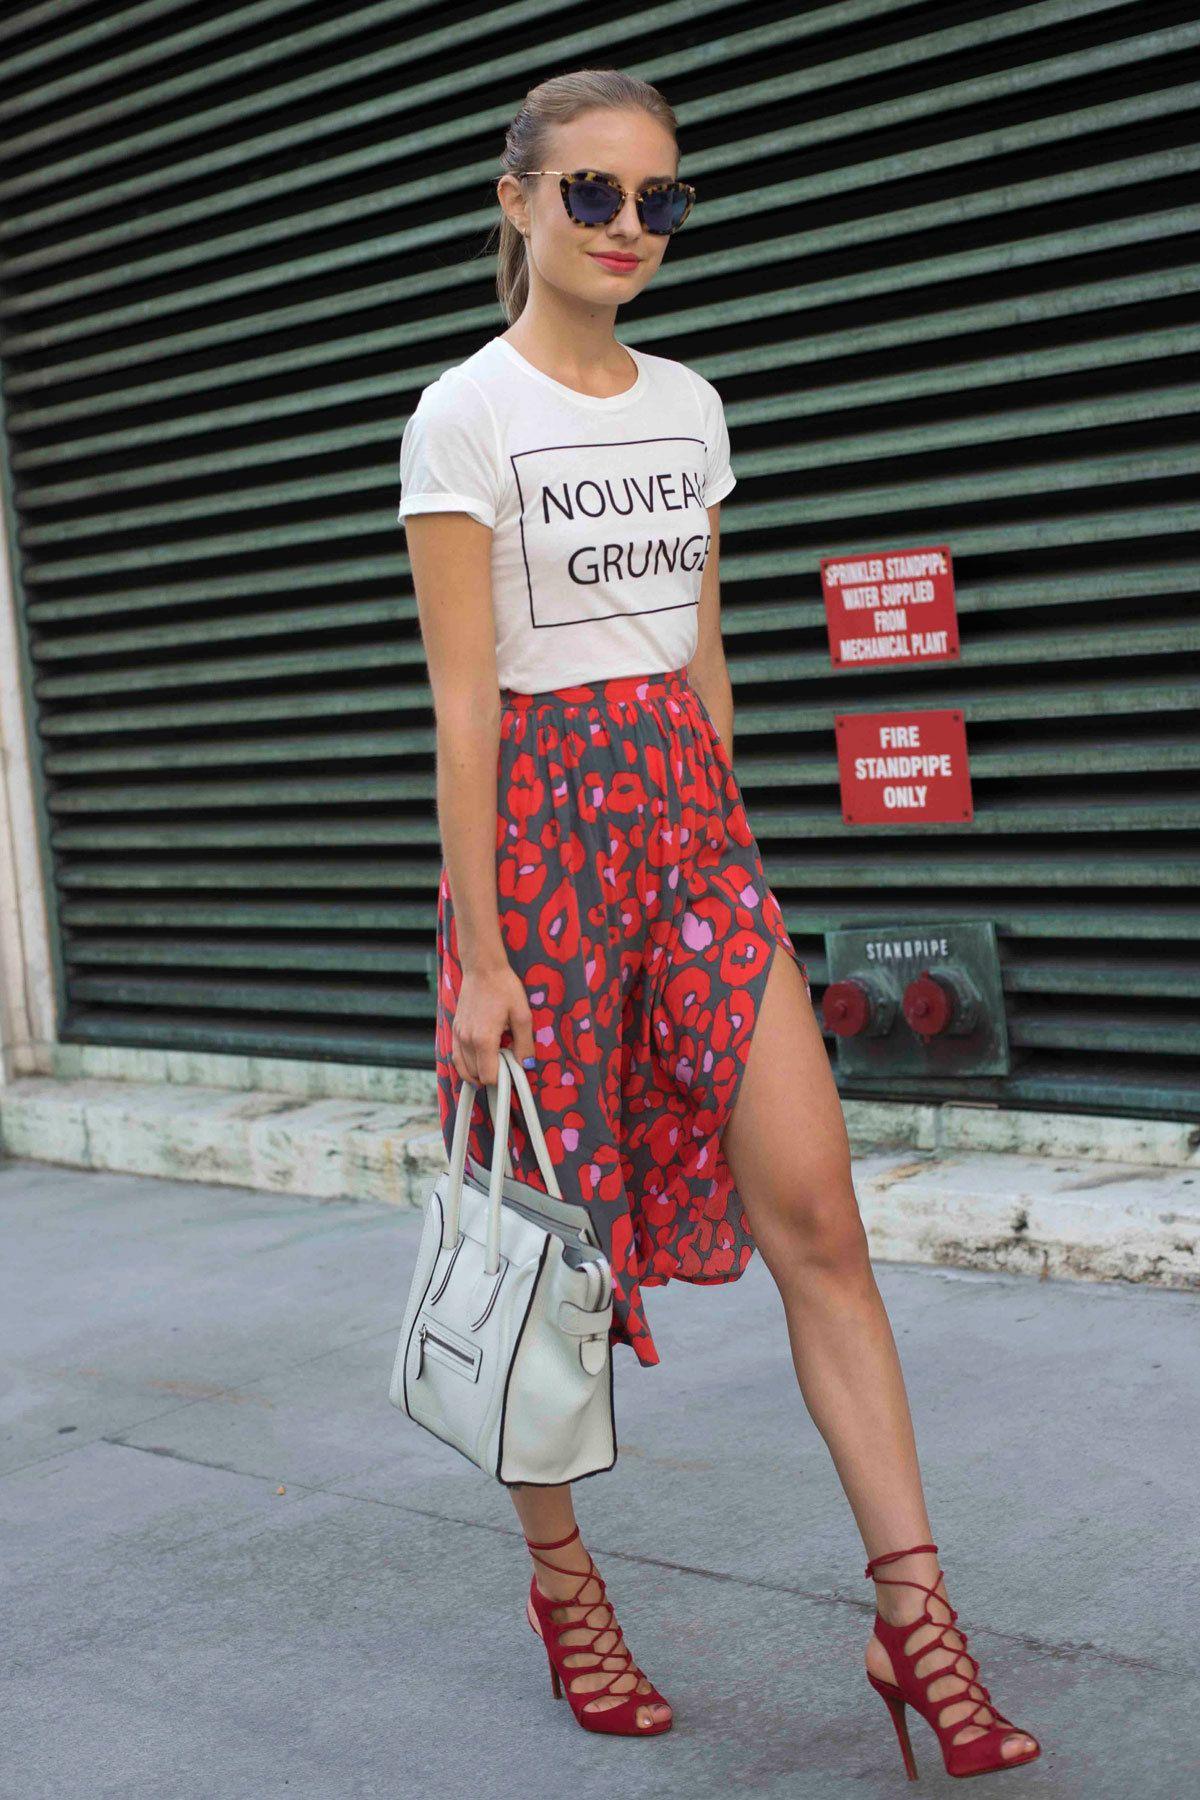 New york fashion week t shirt 83